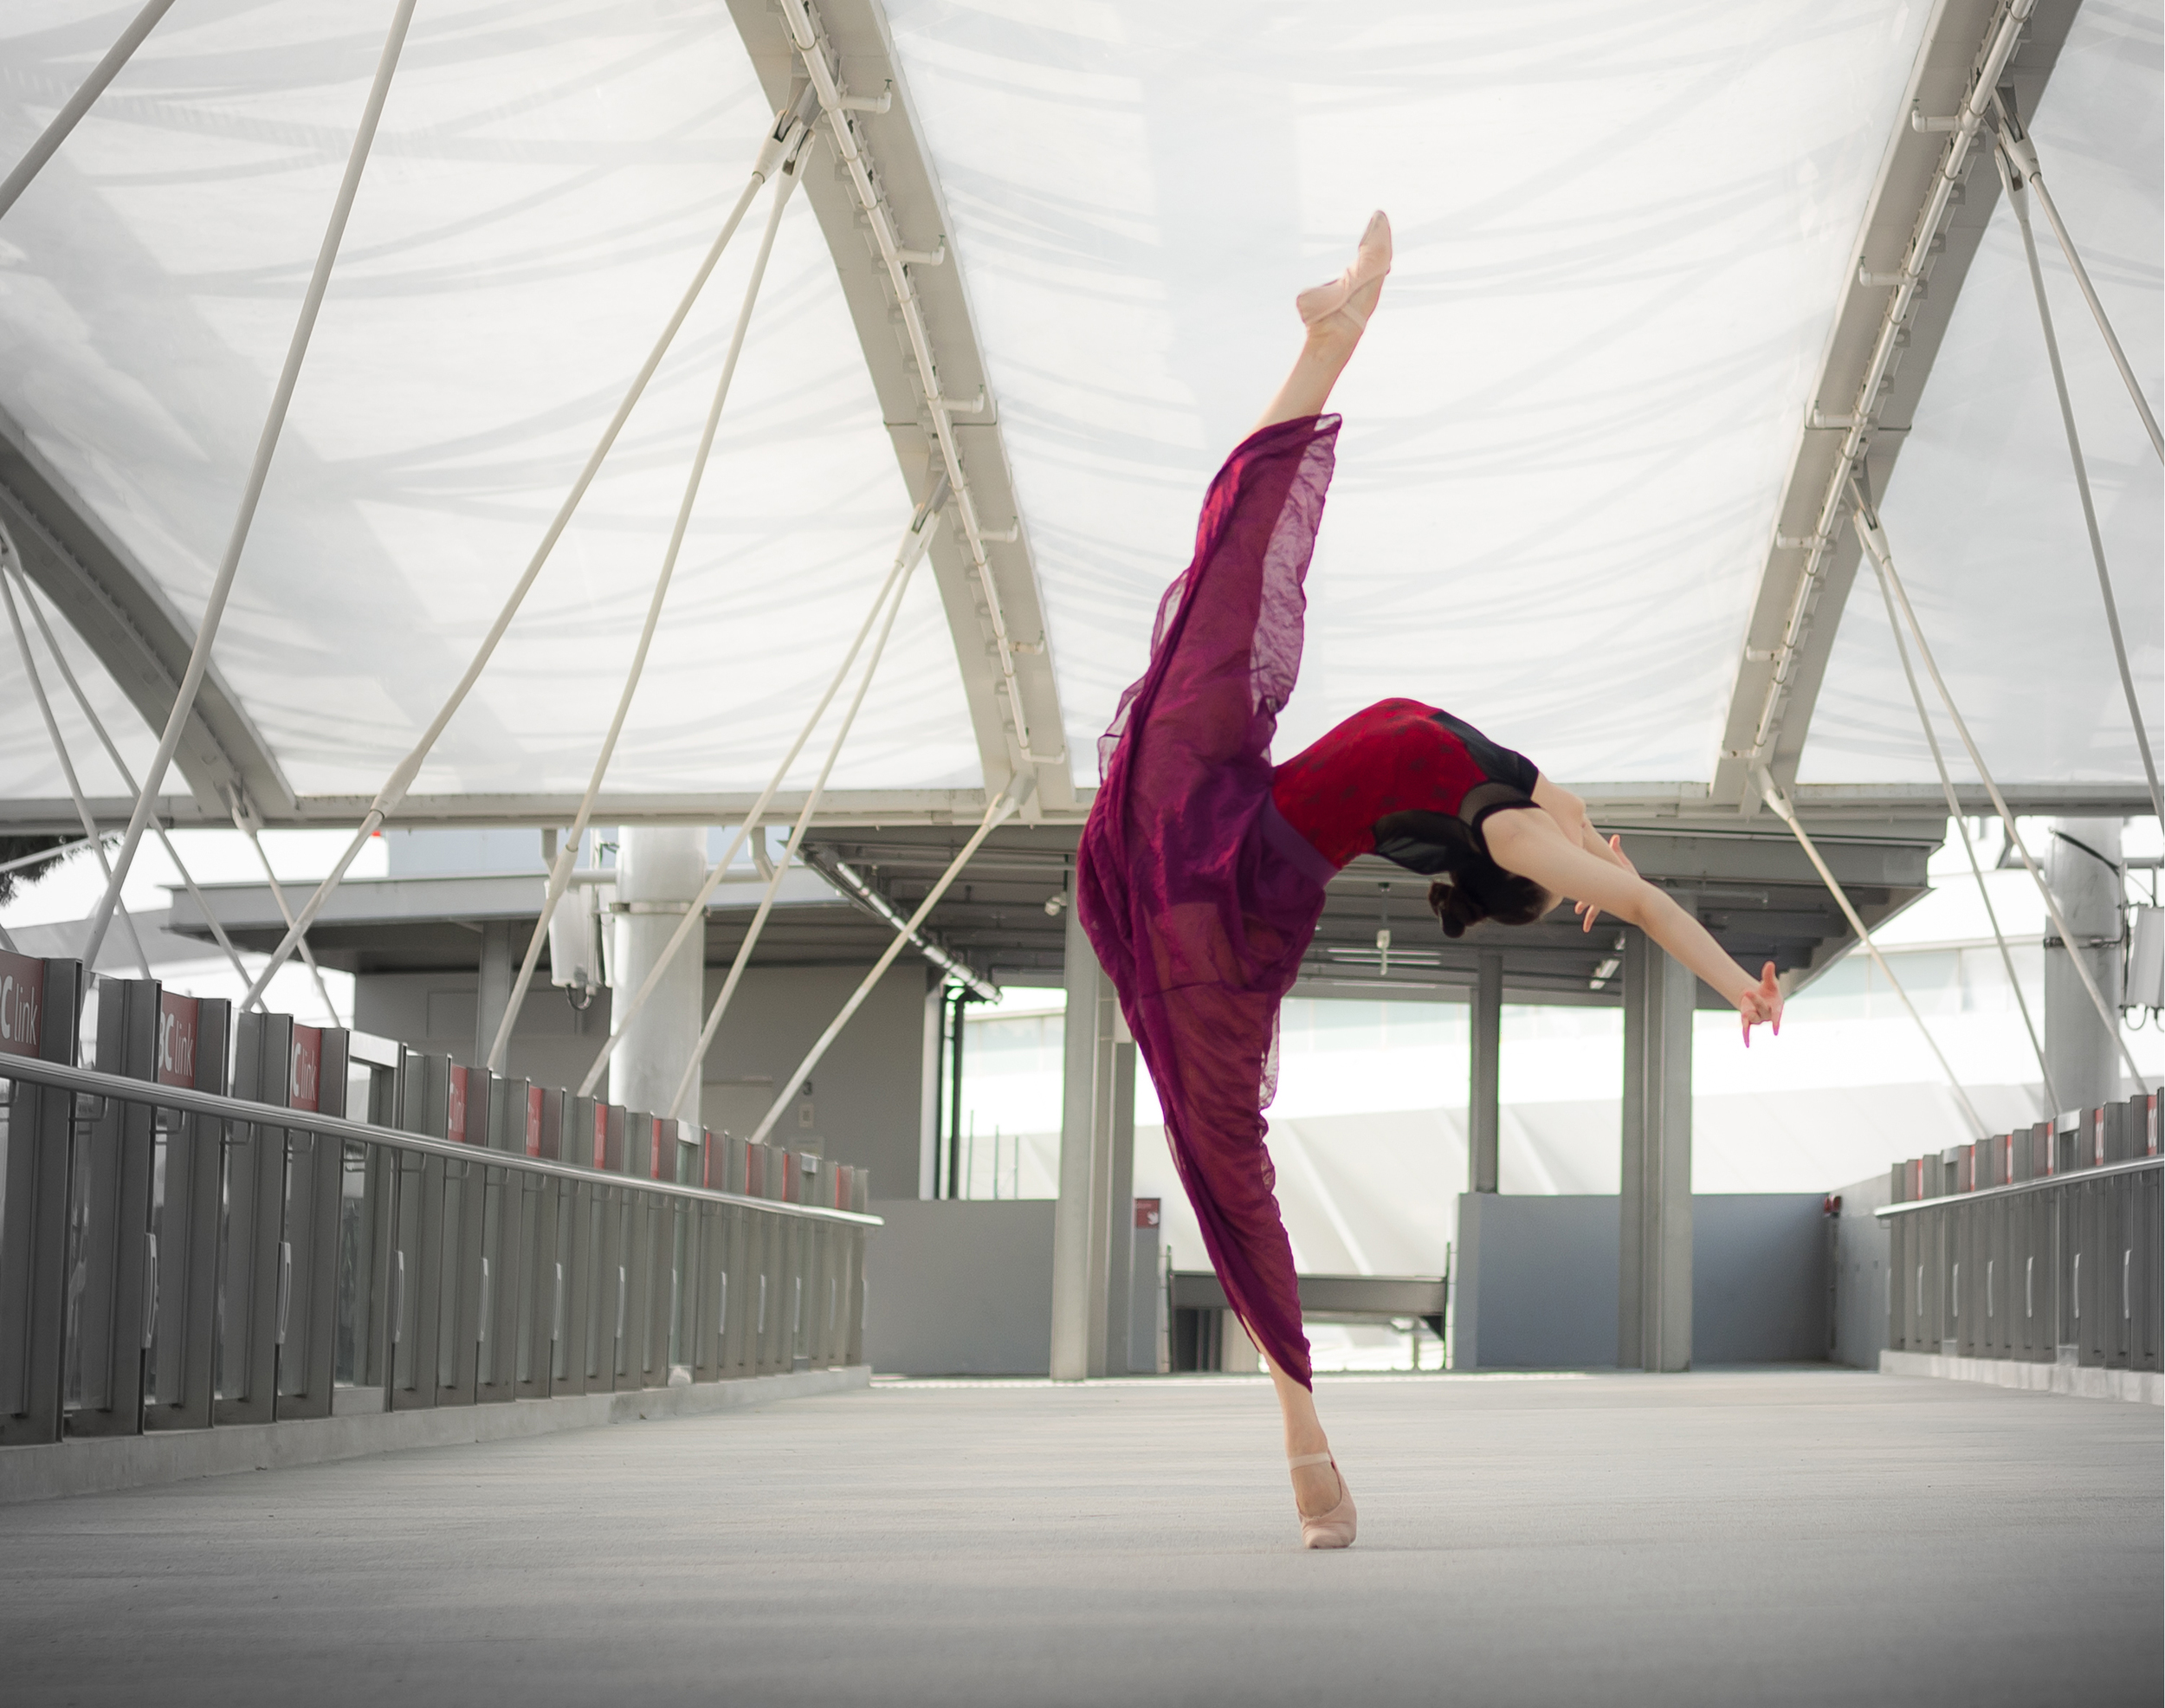 Wang Wen Wen for Balletlove.co